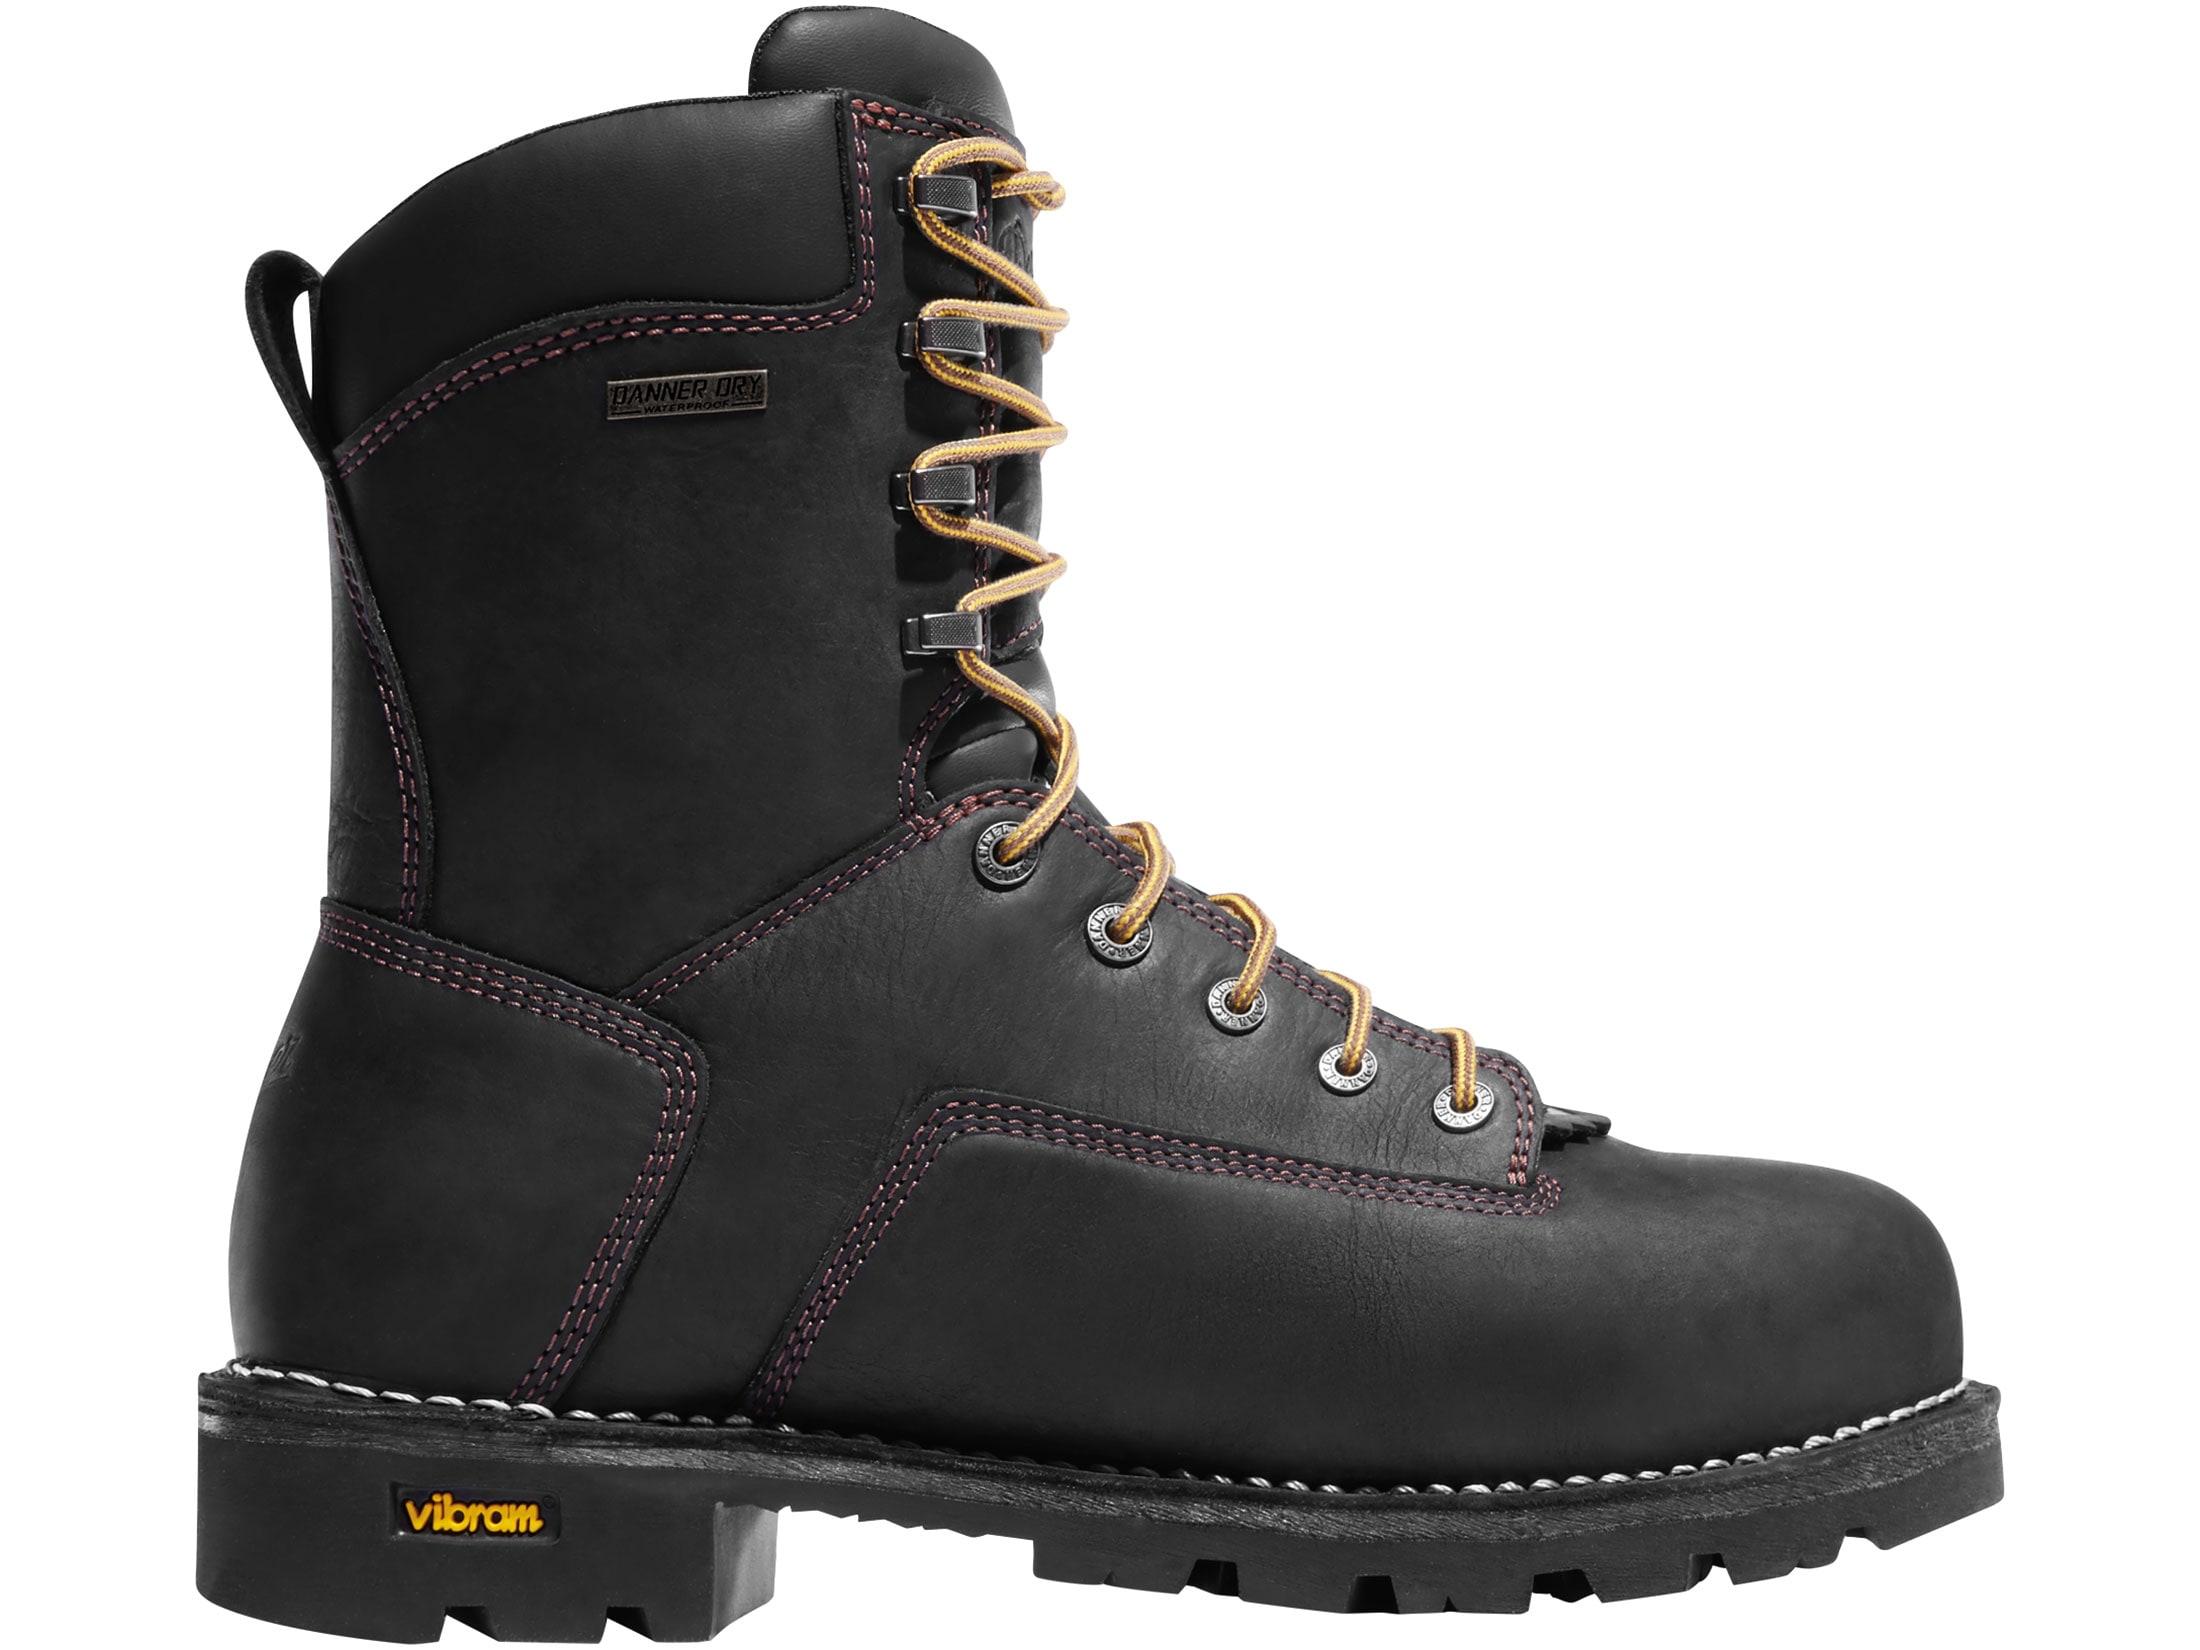 dd36600d336 Danner Gritstone 8 Aluminum Toe Work Boots Leather Black Men's 9.5 D